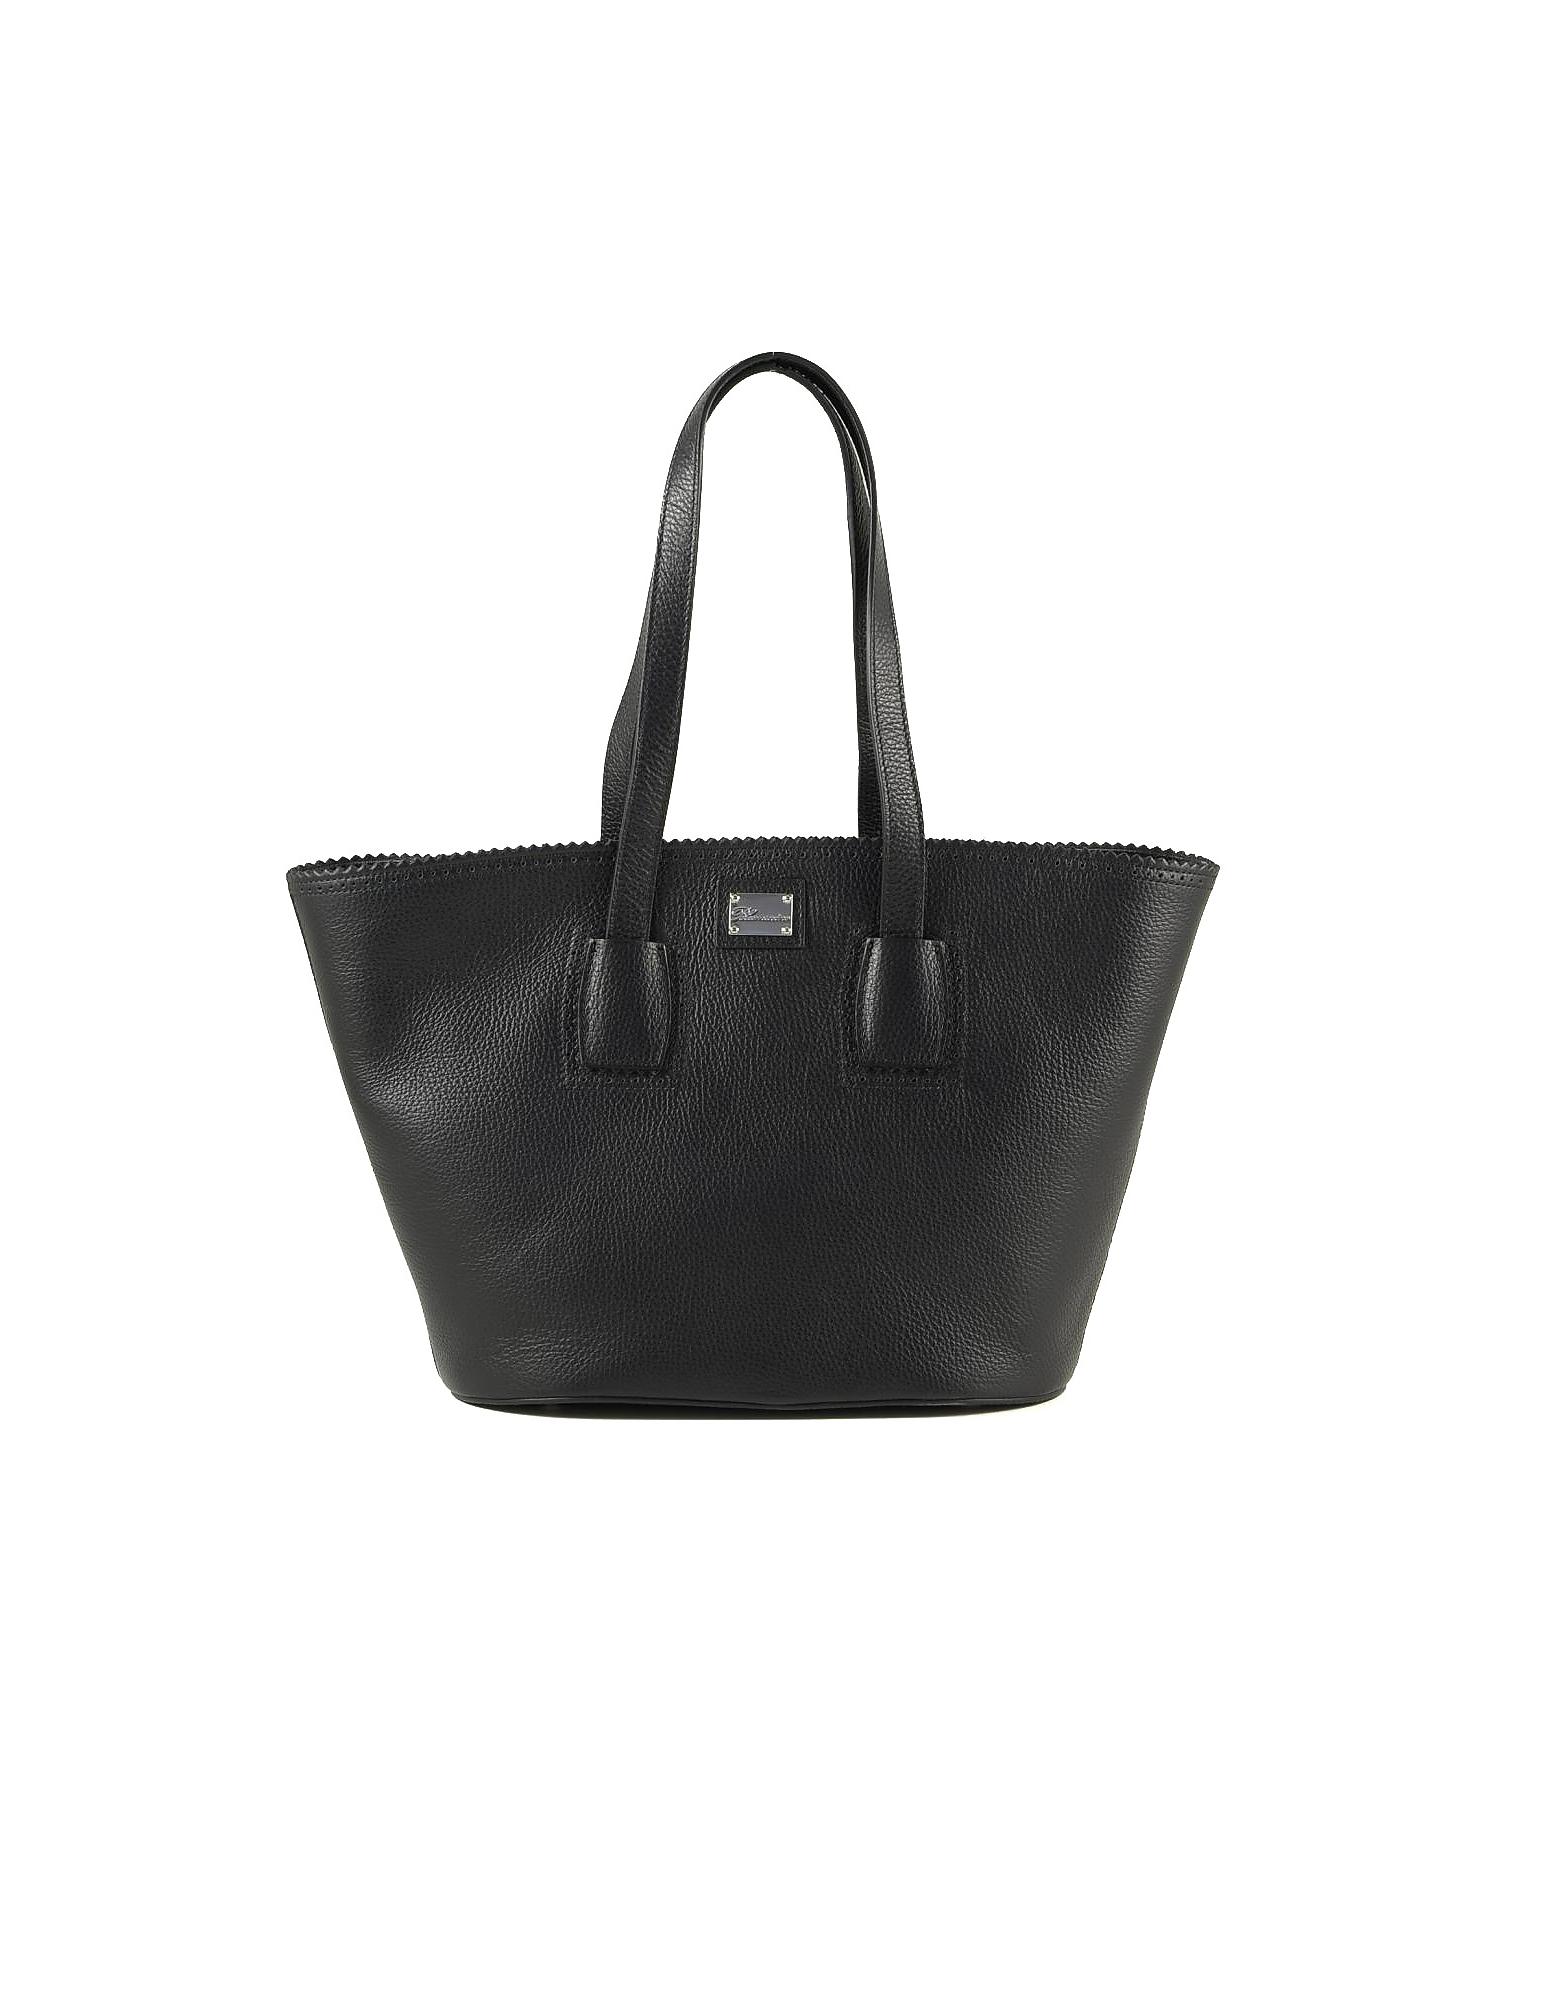 Blumarine Designer Handbags, Black Tote Bag w/Logo